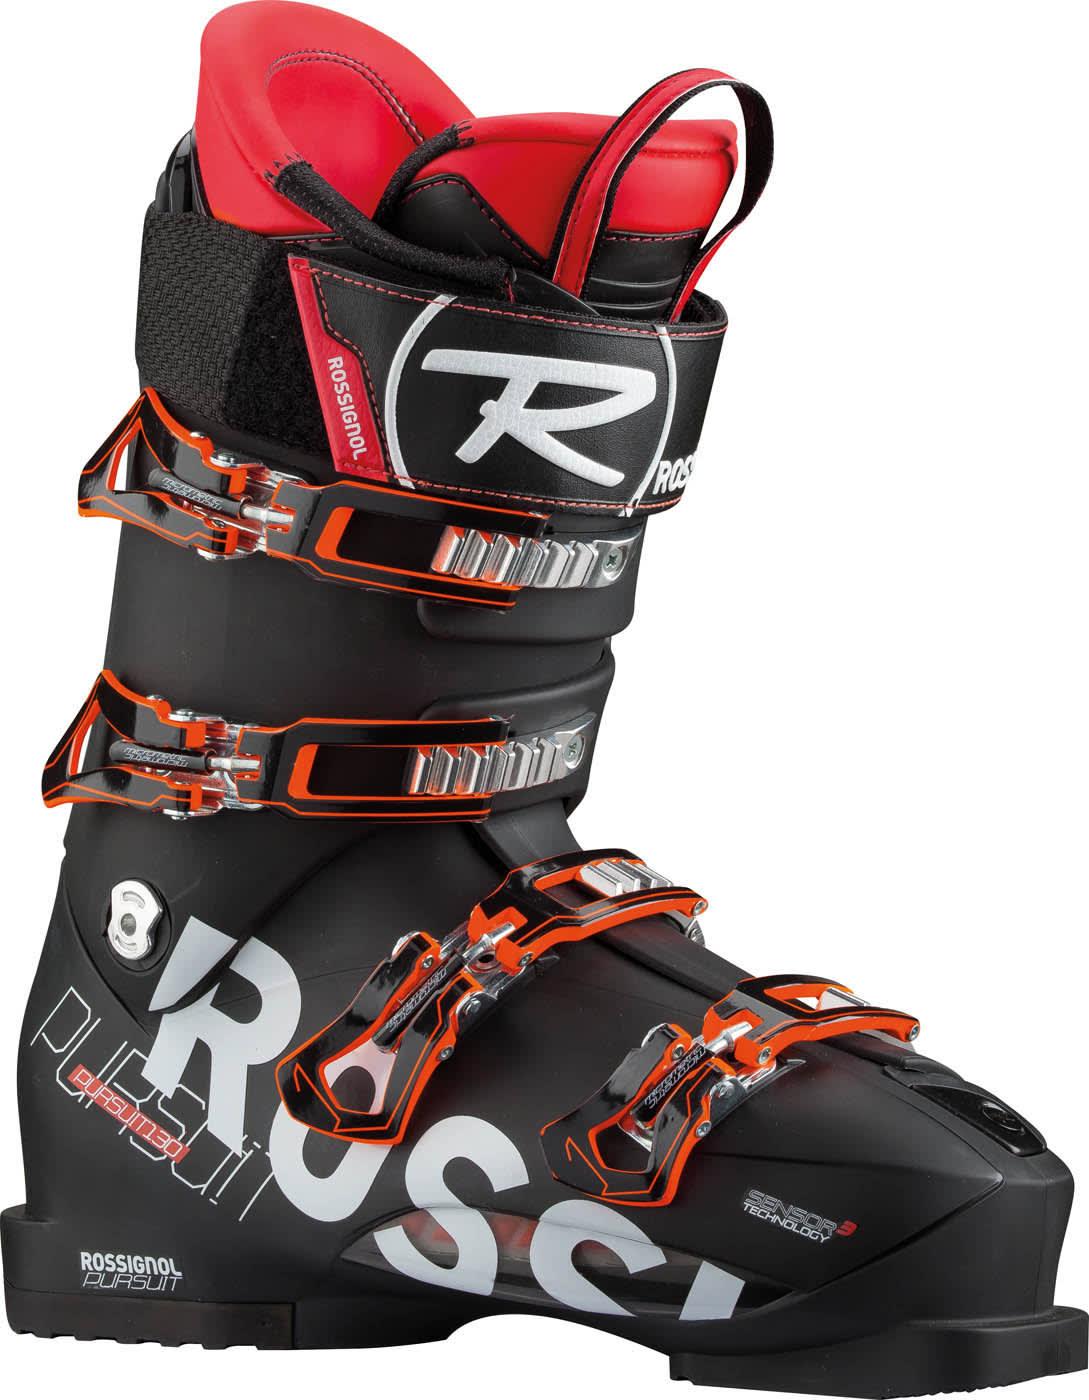 Rossignol Pursuit Sensor3 130 Ski Boots